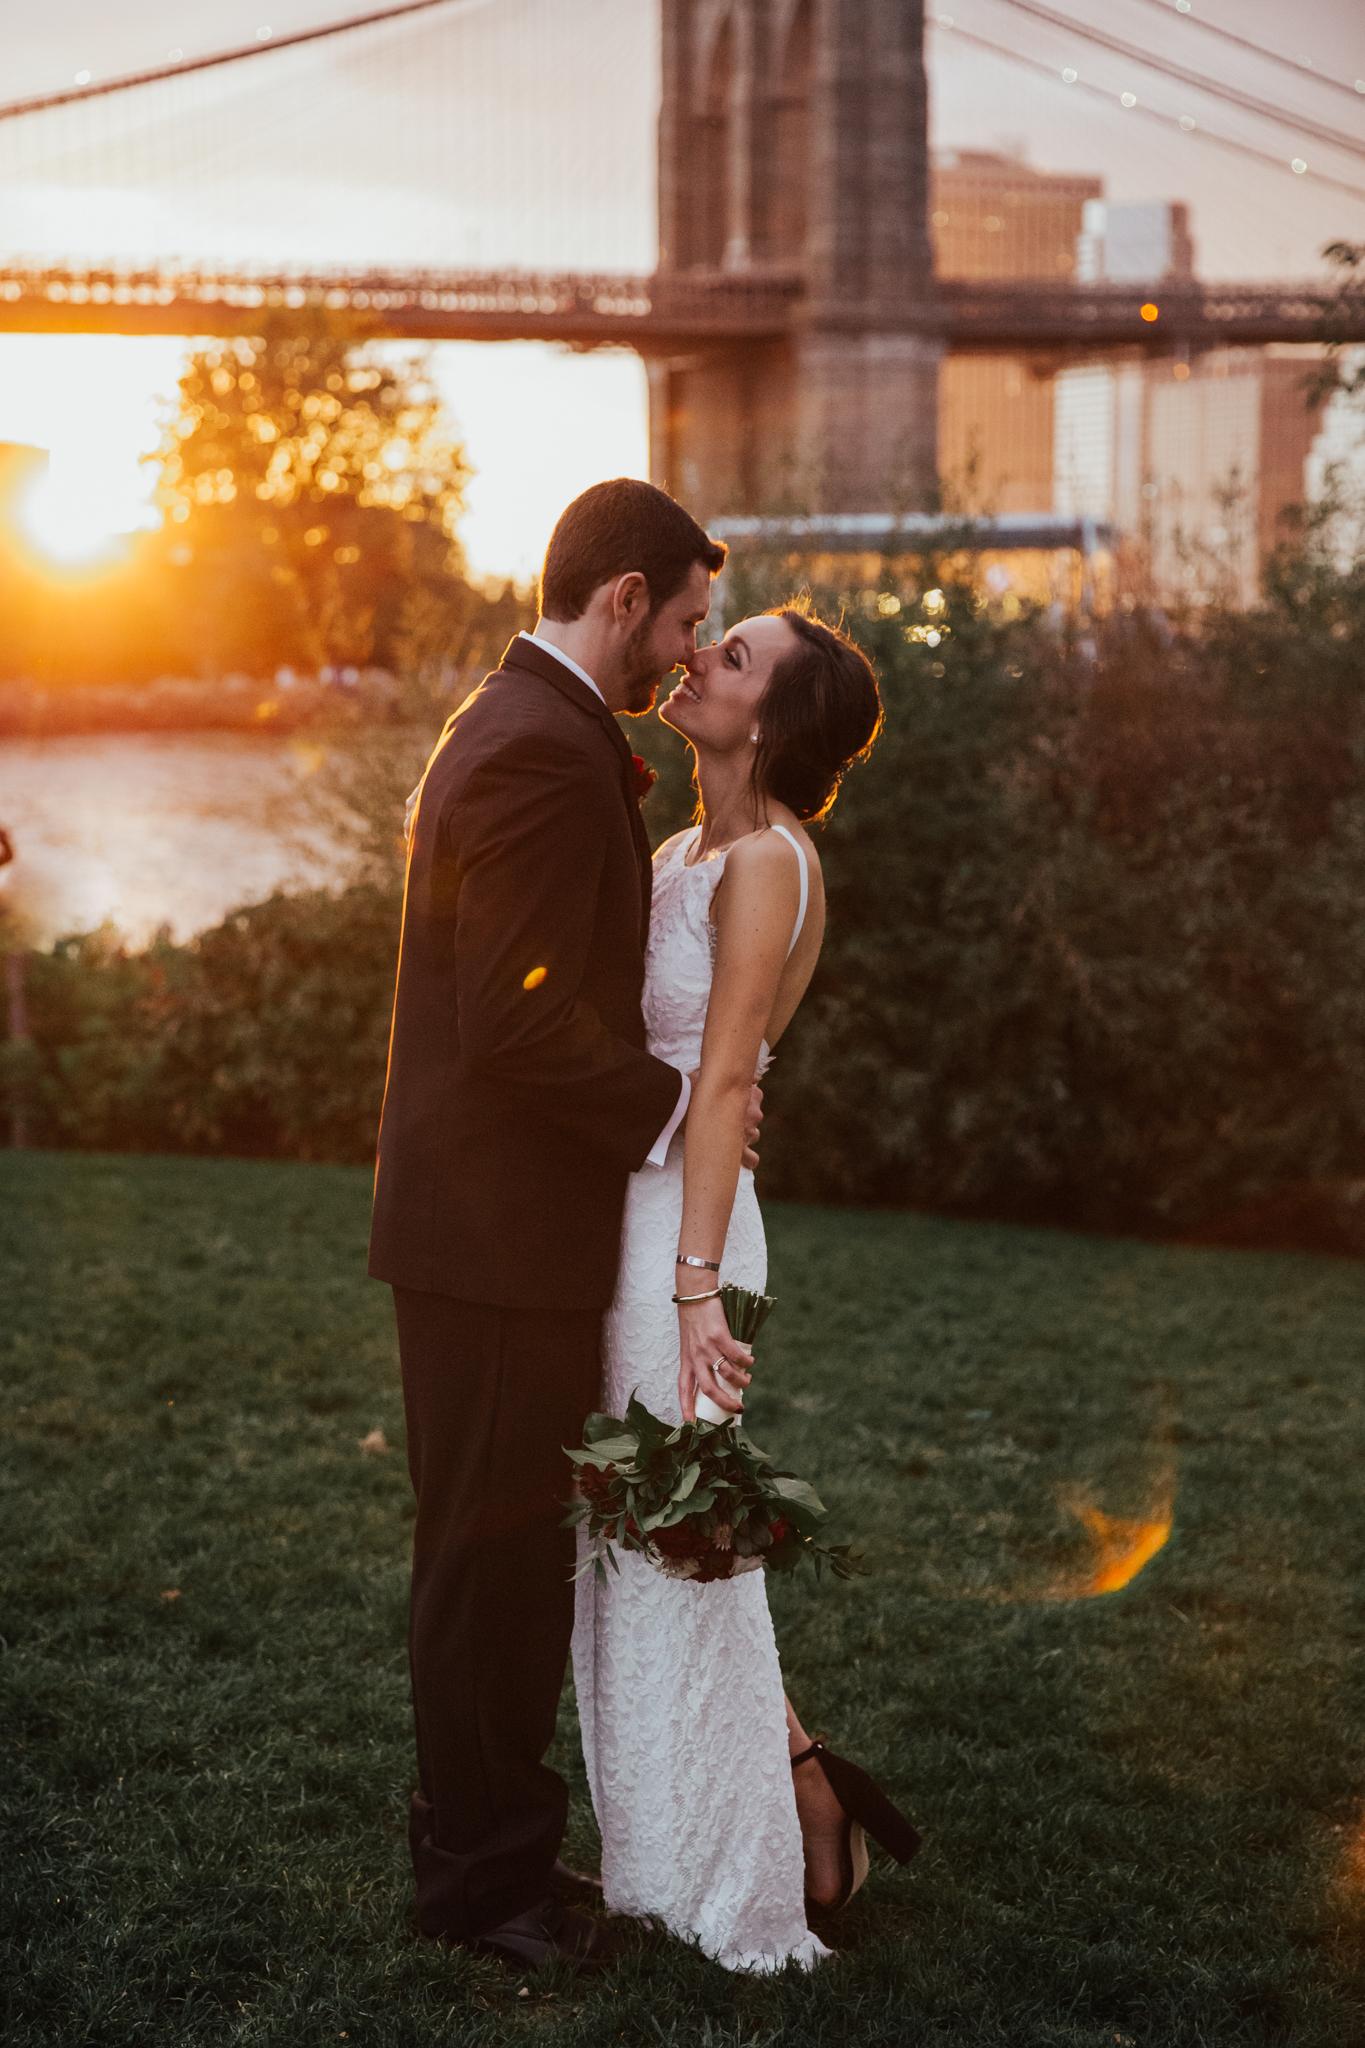 26-bridge-wedding-brooklyn-072.JPG